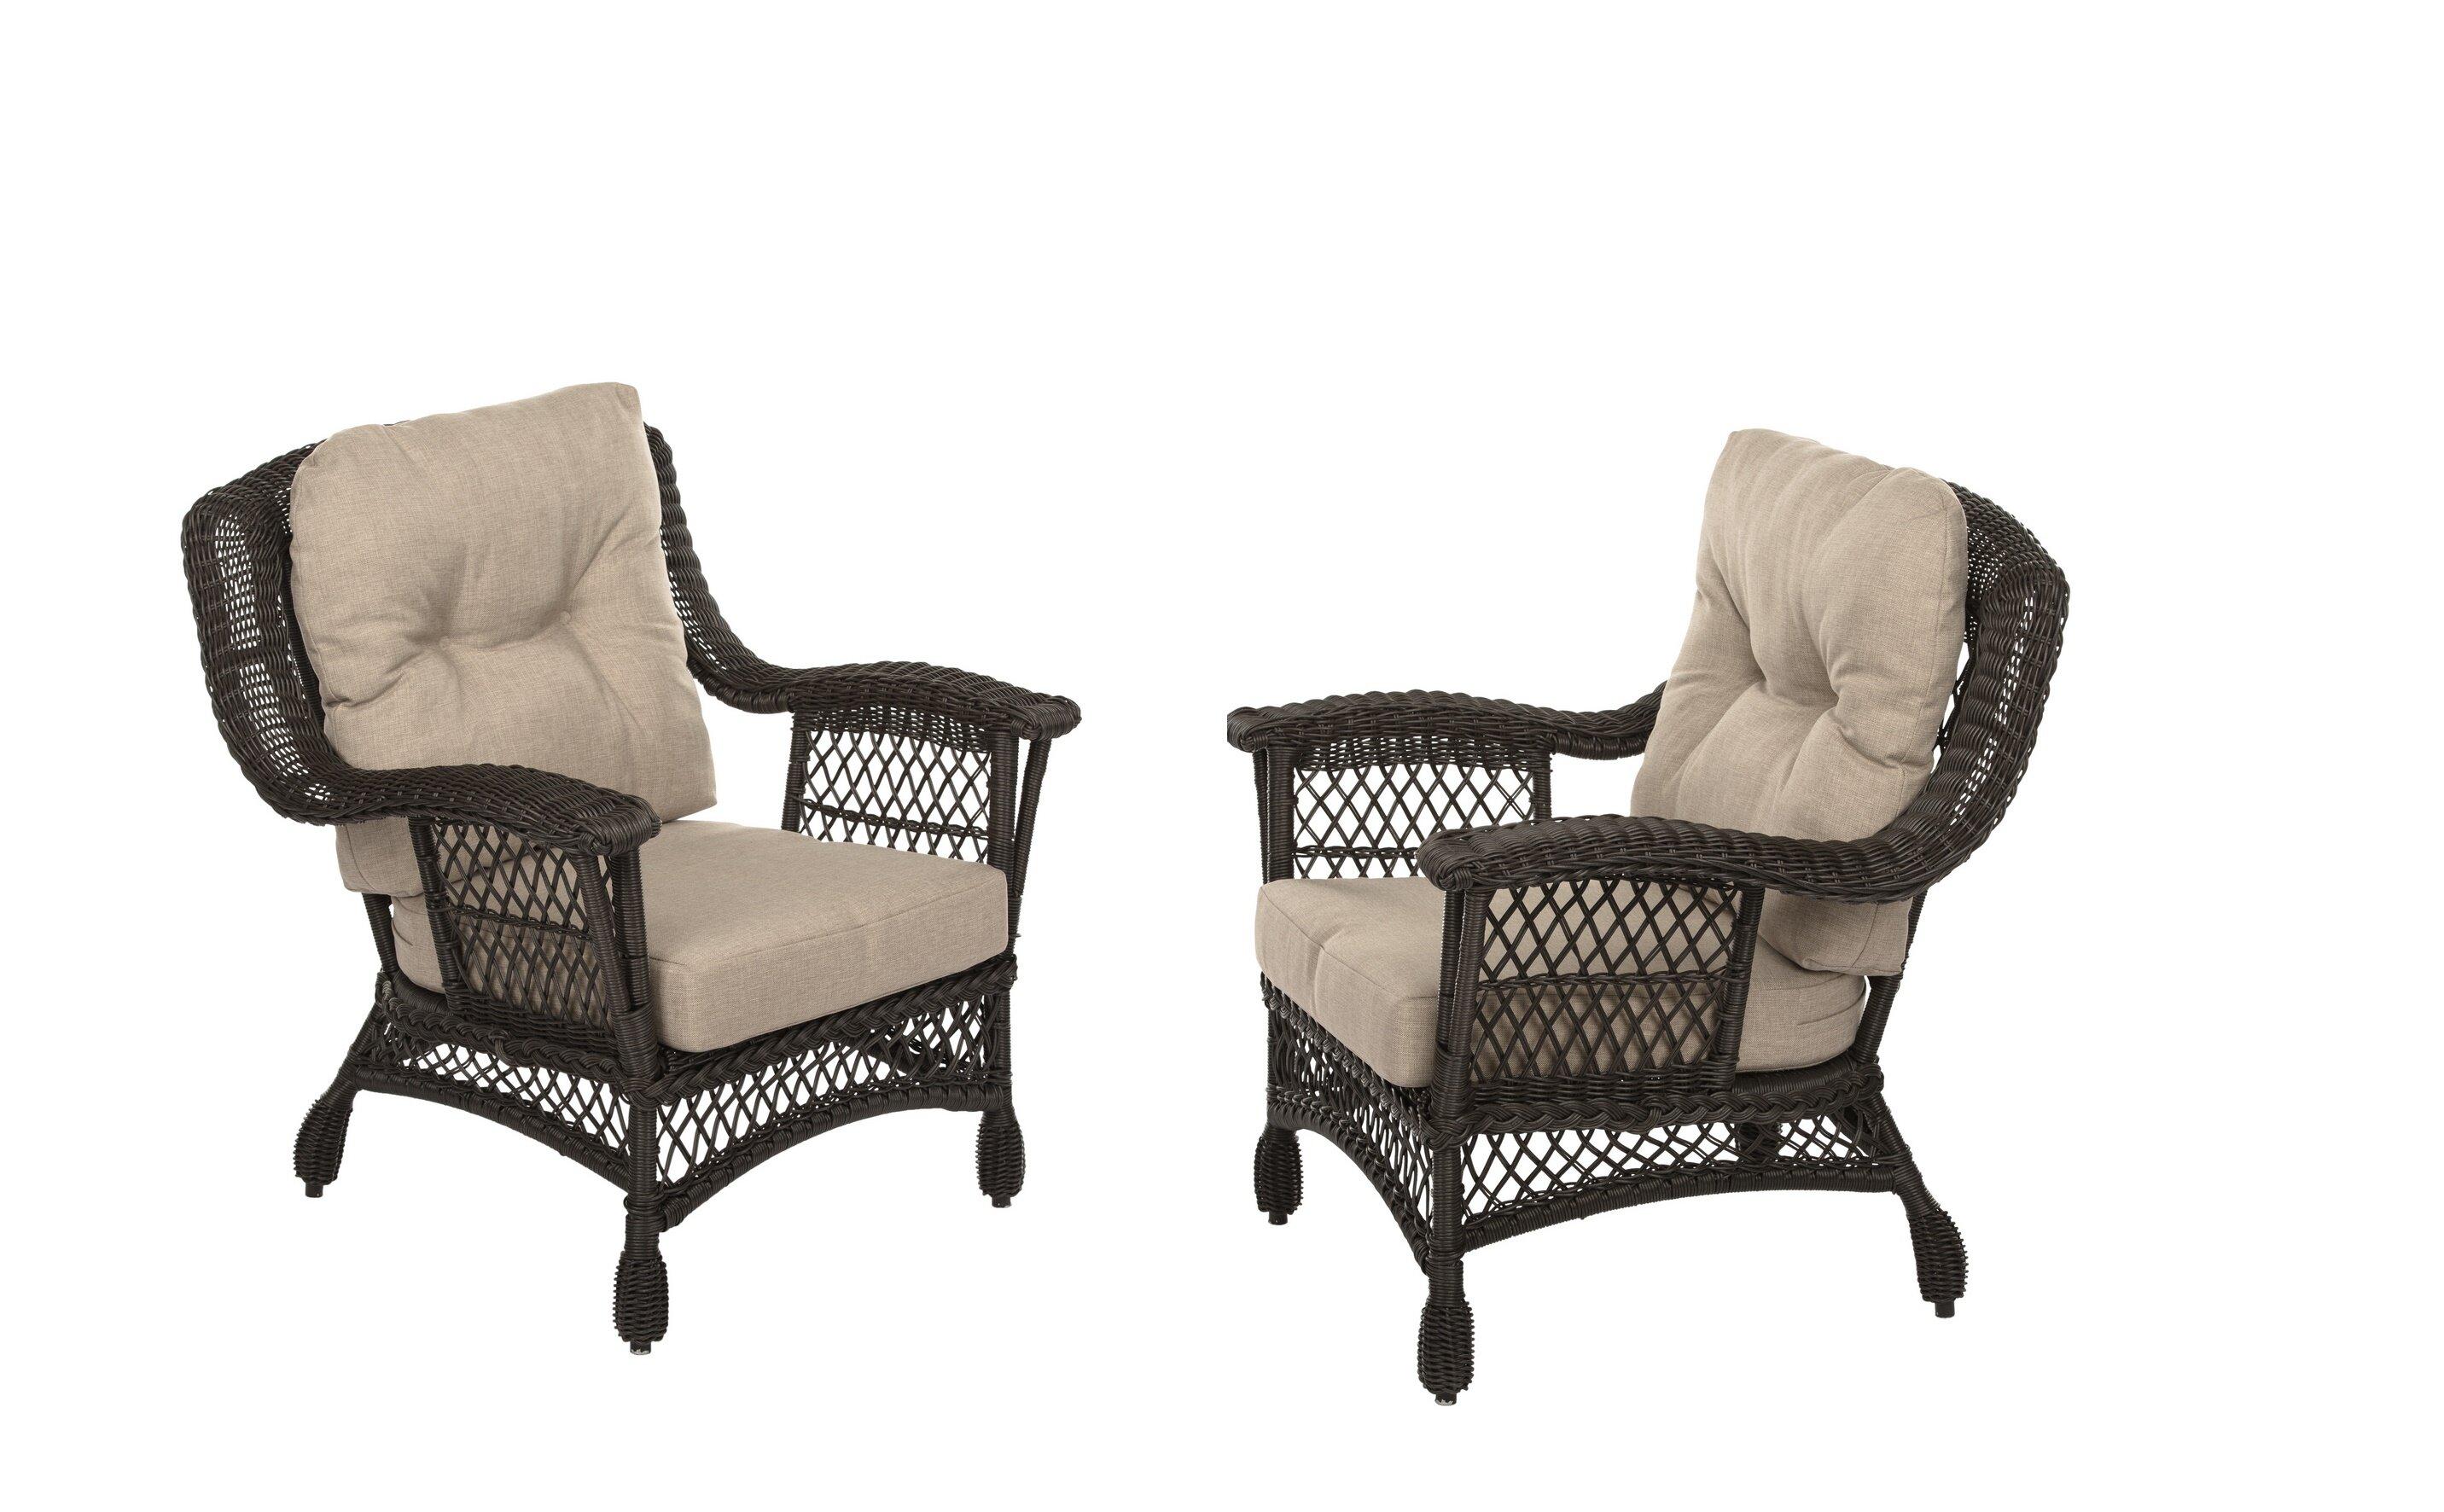 Demott Outdoor Garden Arm Chairs